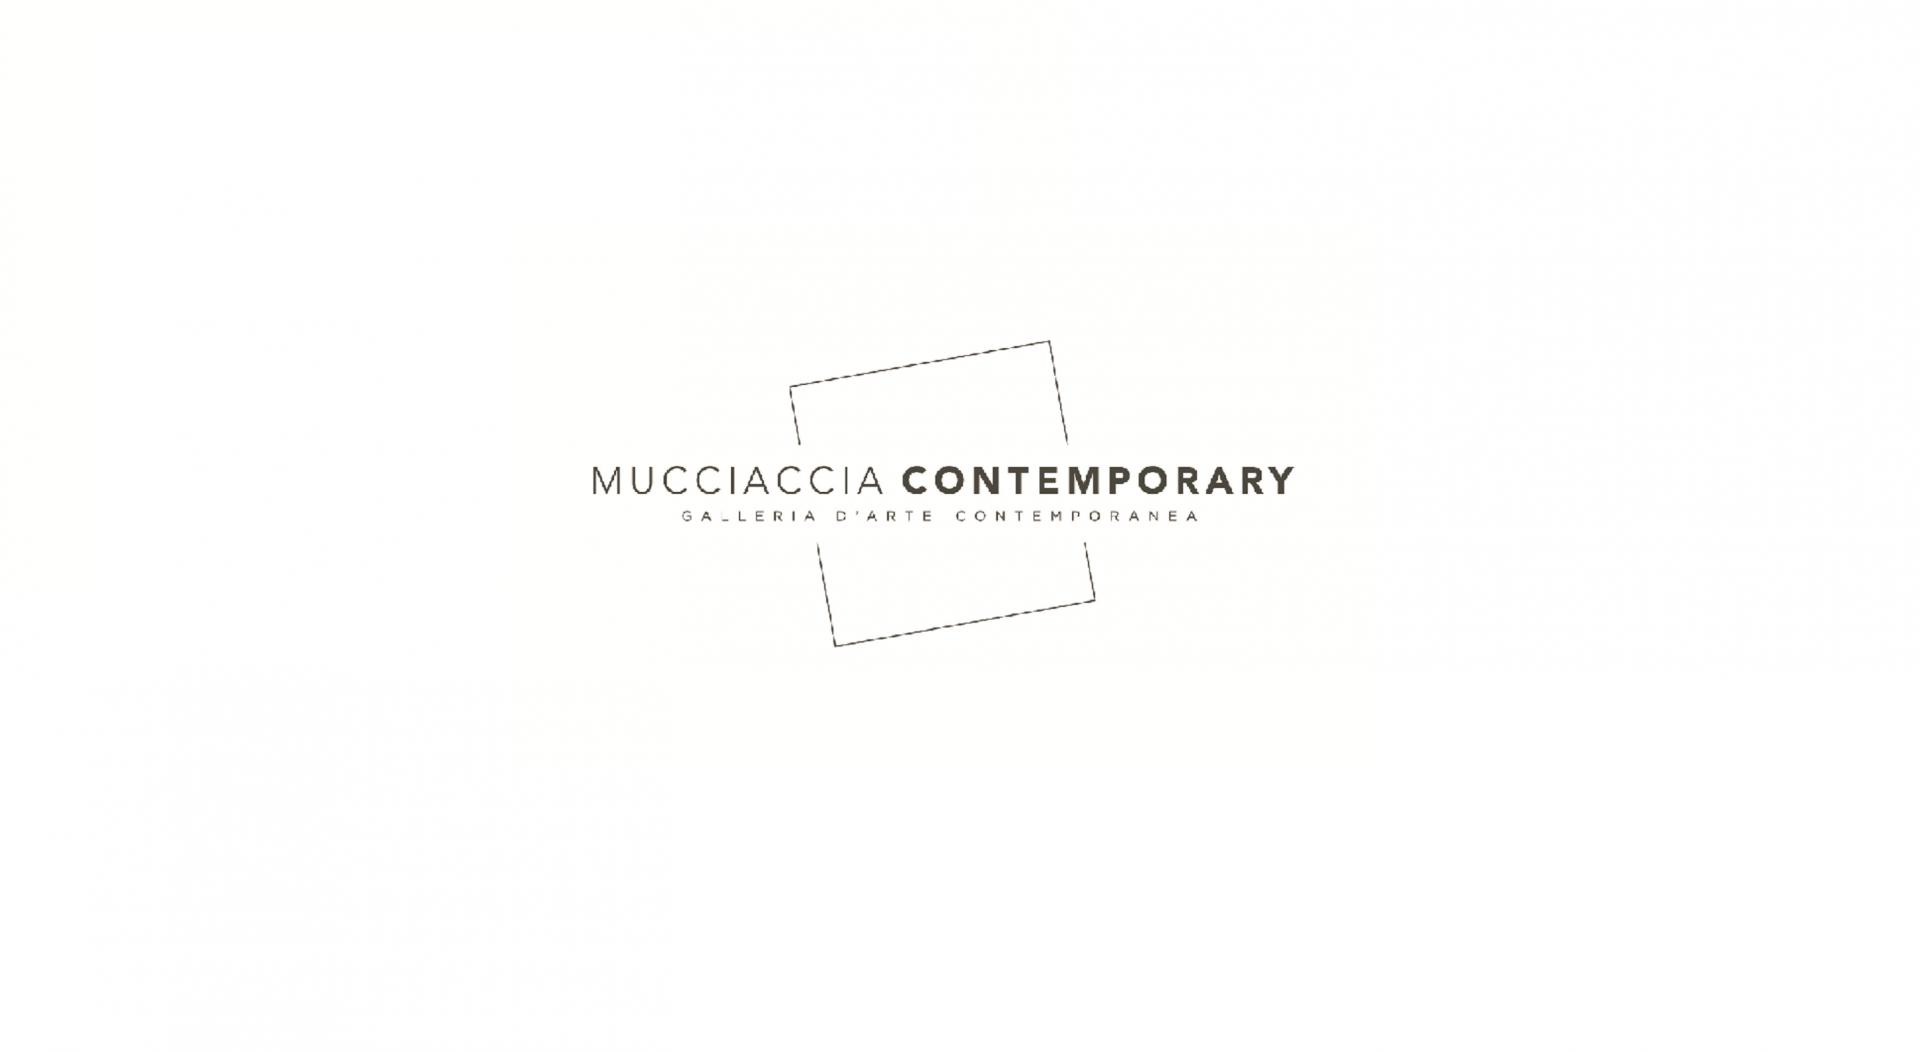 mucciacciacontemporary